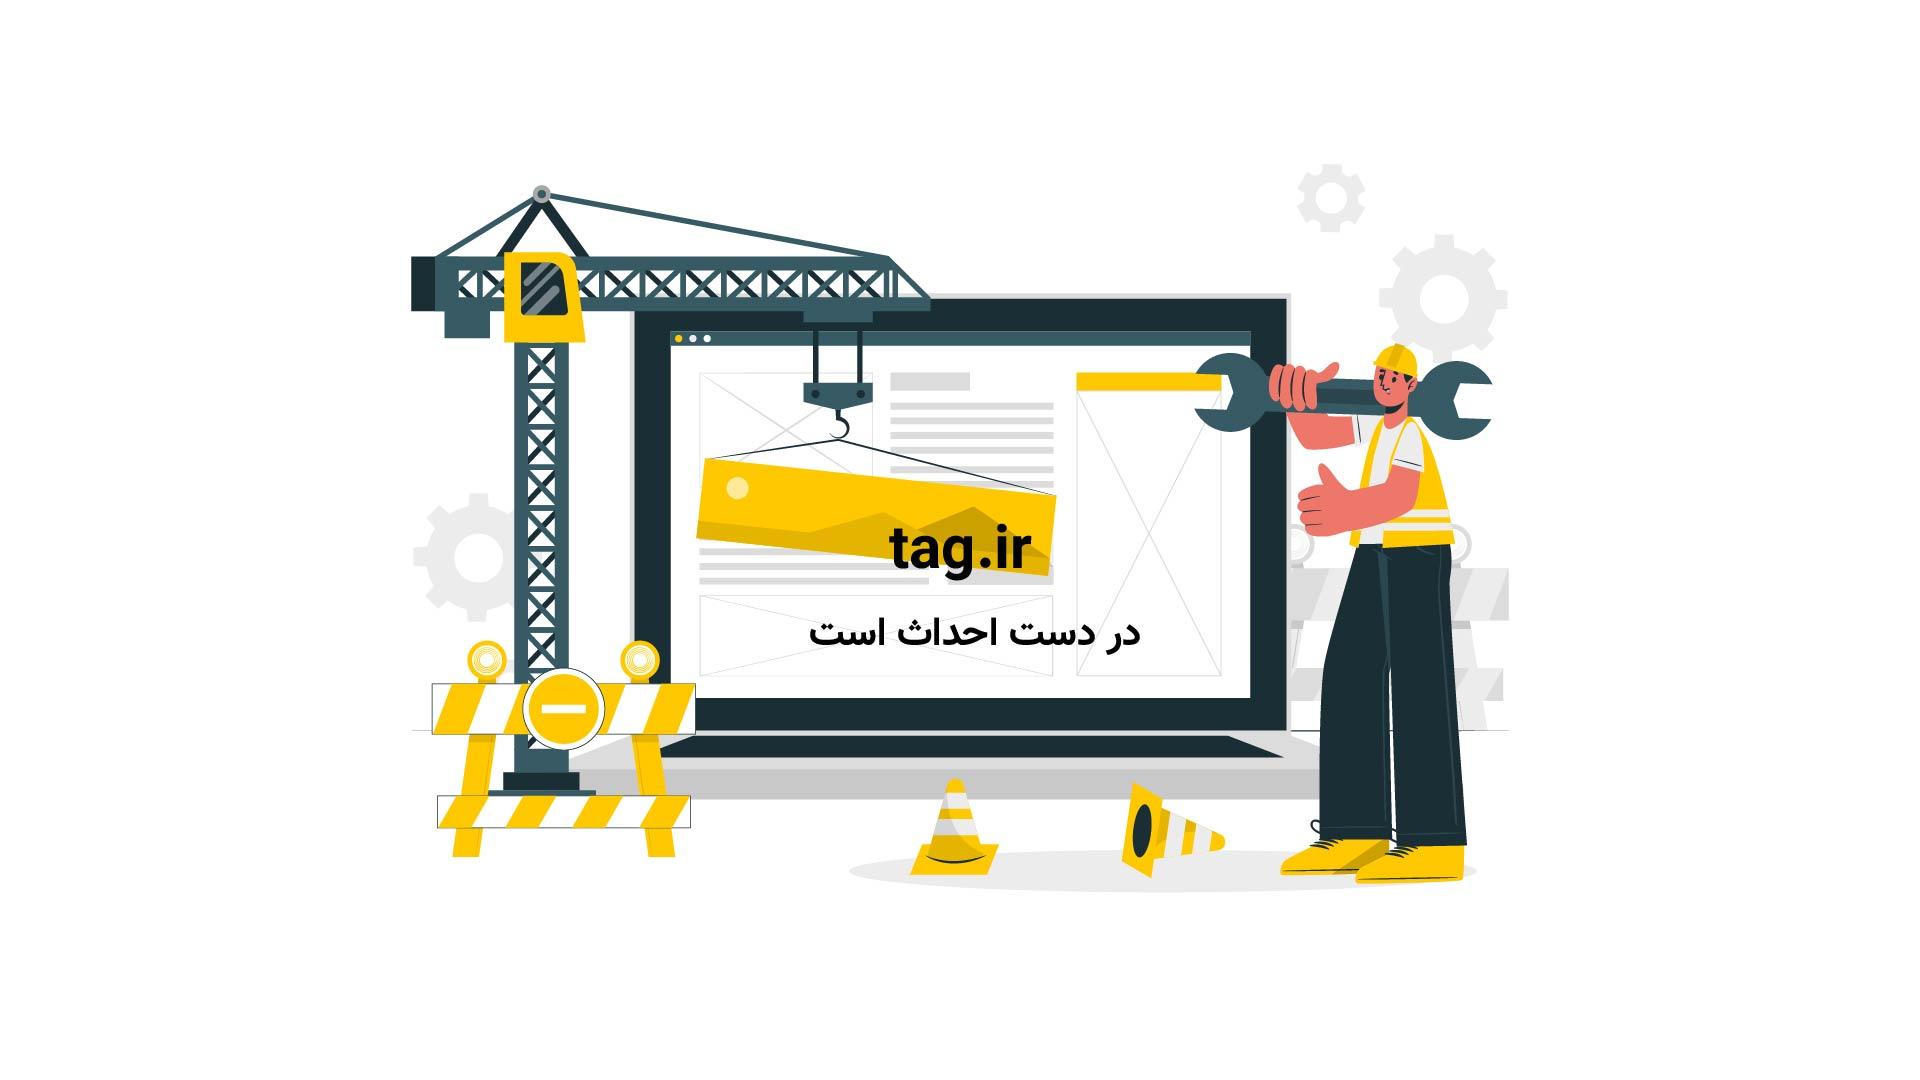 هواي برفي و ليز خوردن جالب بوئينگ ٧٣٧ بدليل وزش شديد باد و لغزندگى سطح اپرون | فیلم